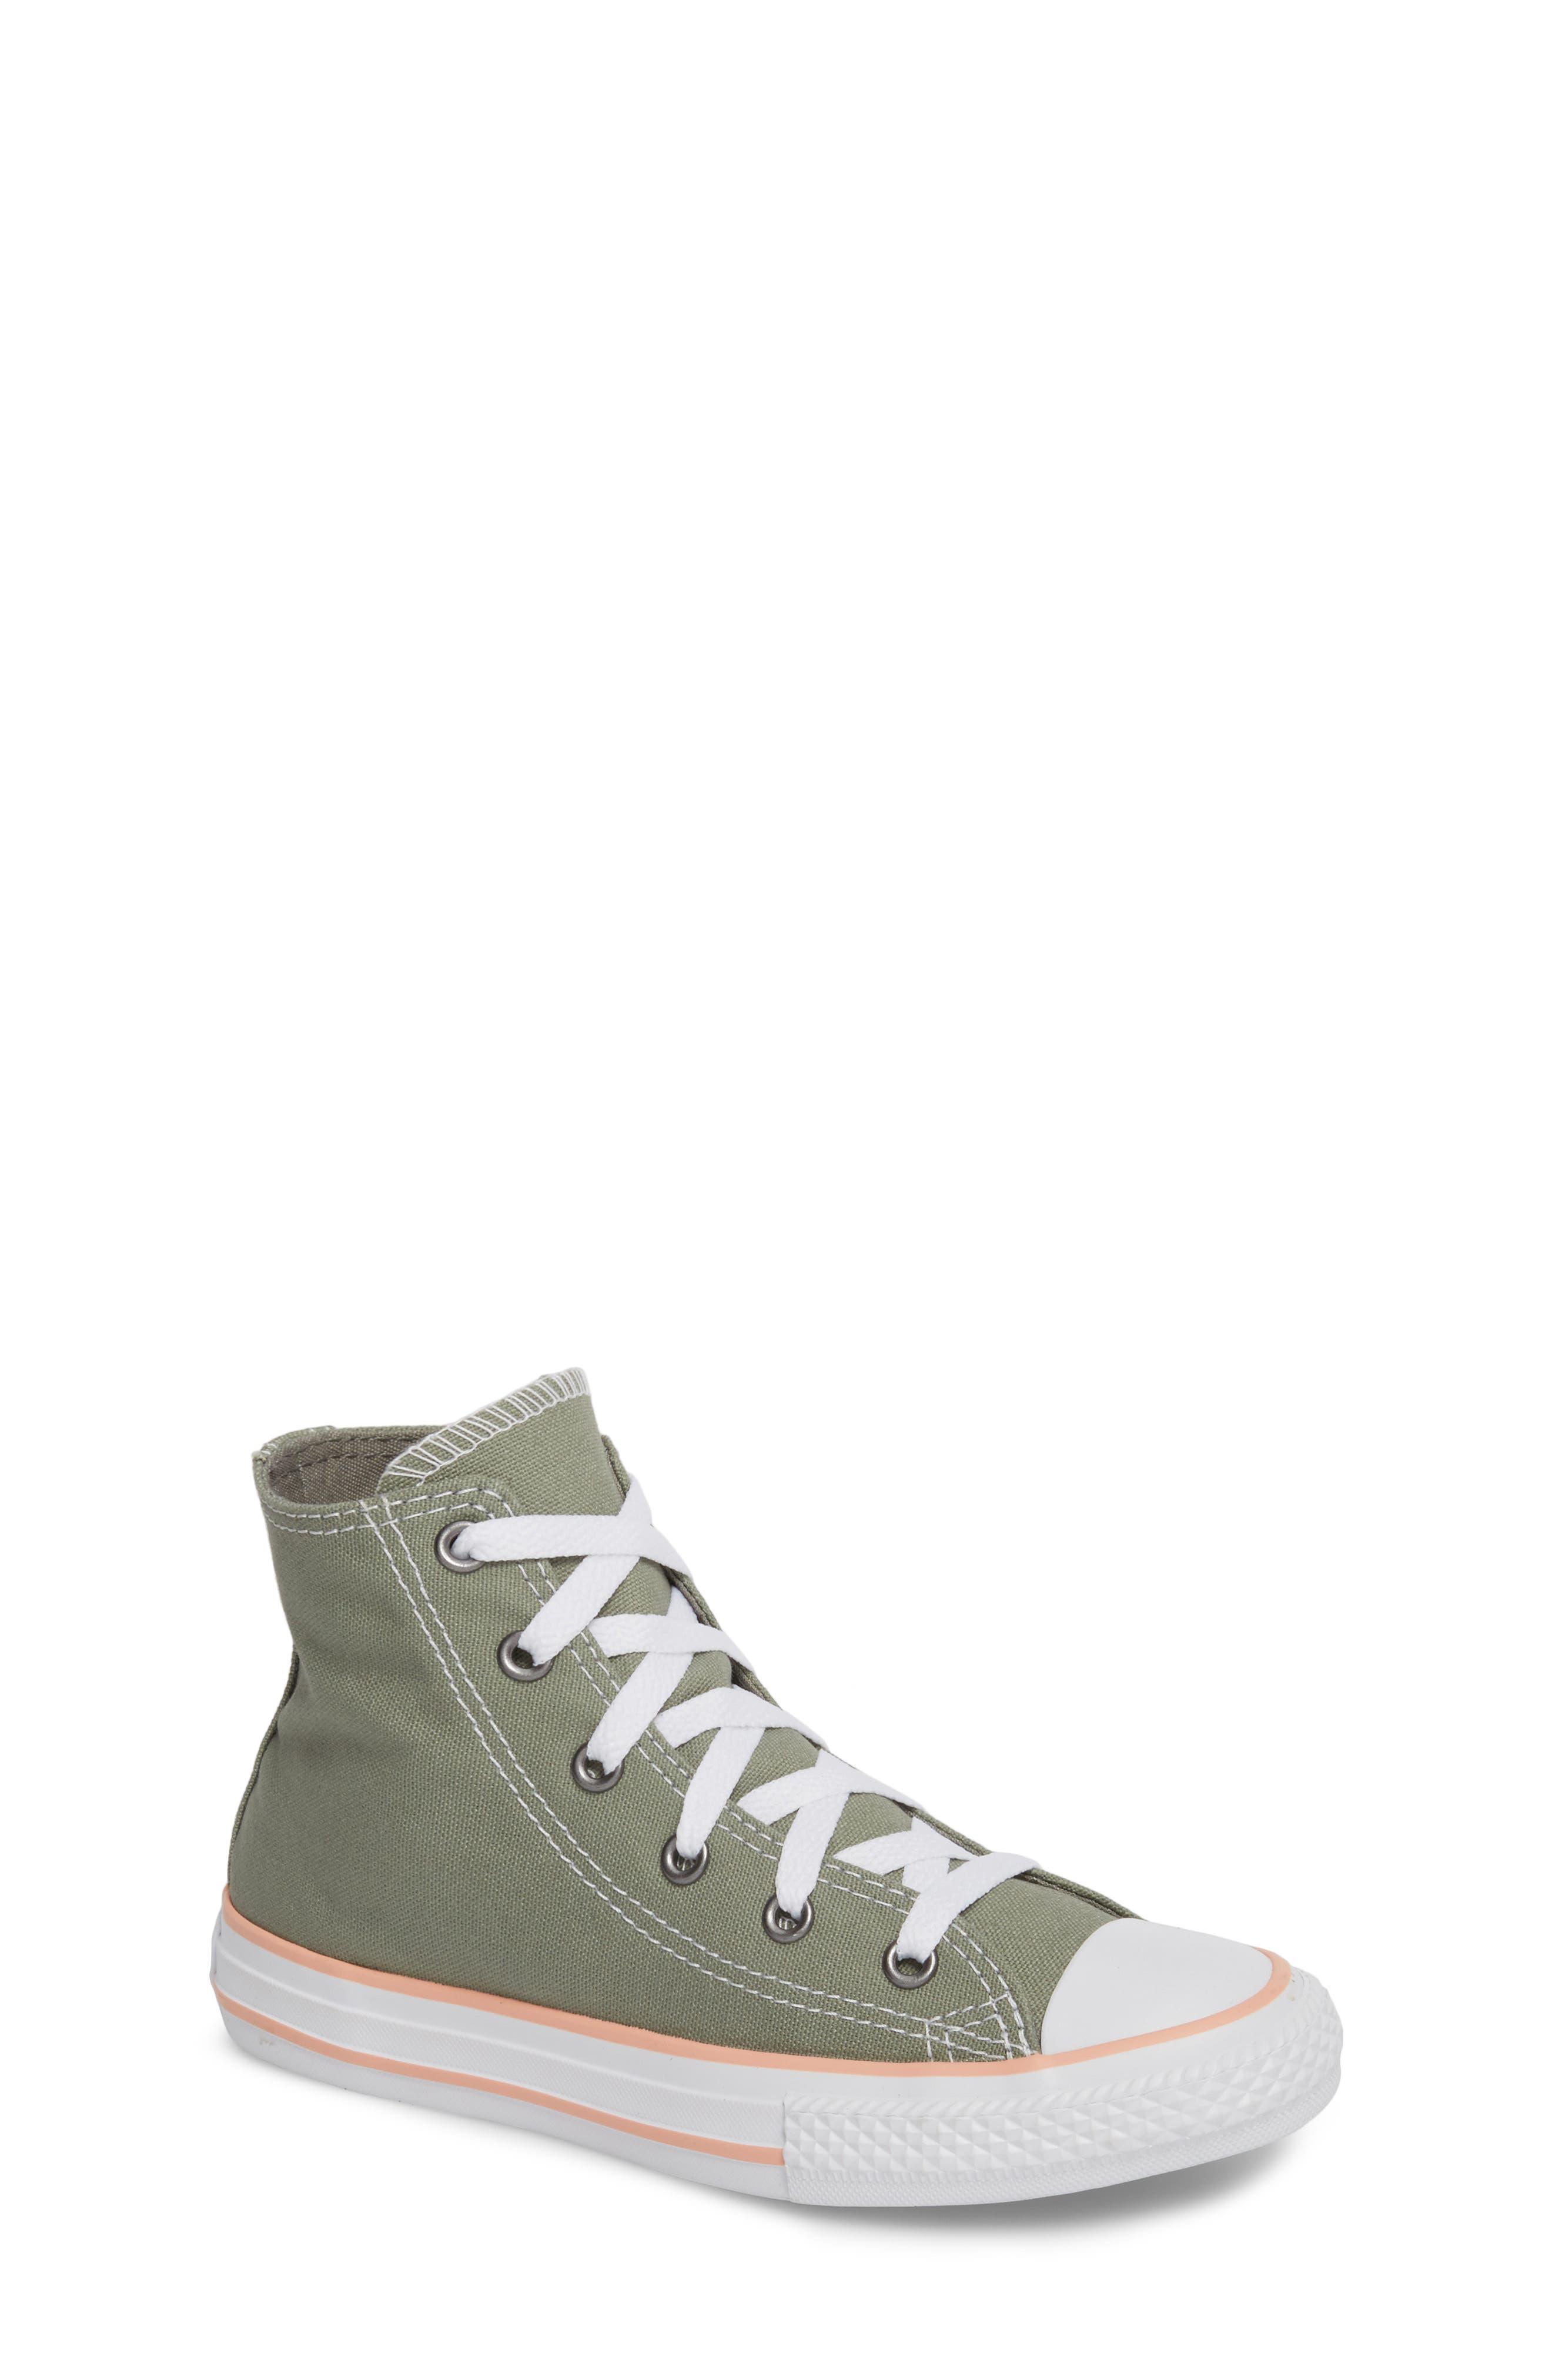 Chuck Taylor<sup>®</sup> All Star<sup>®</sup> High Top Sneaker,                             Main thumbnail 1, color,                             020